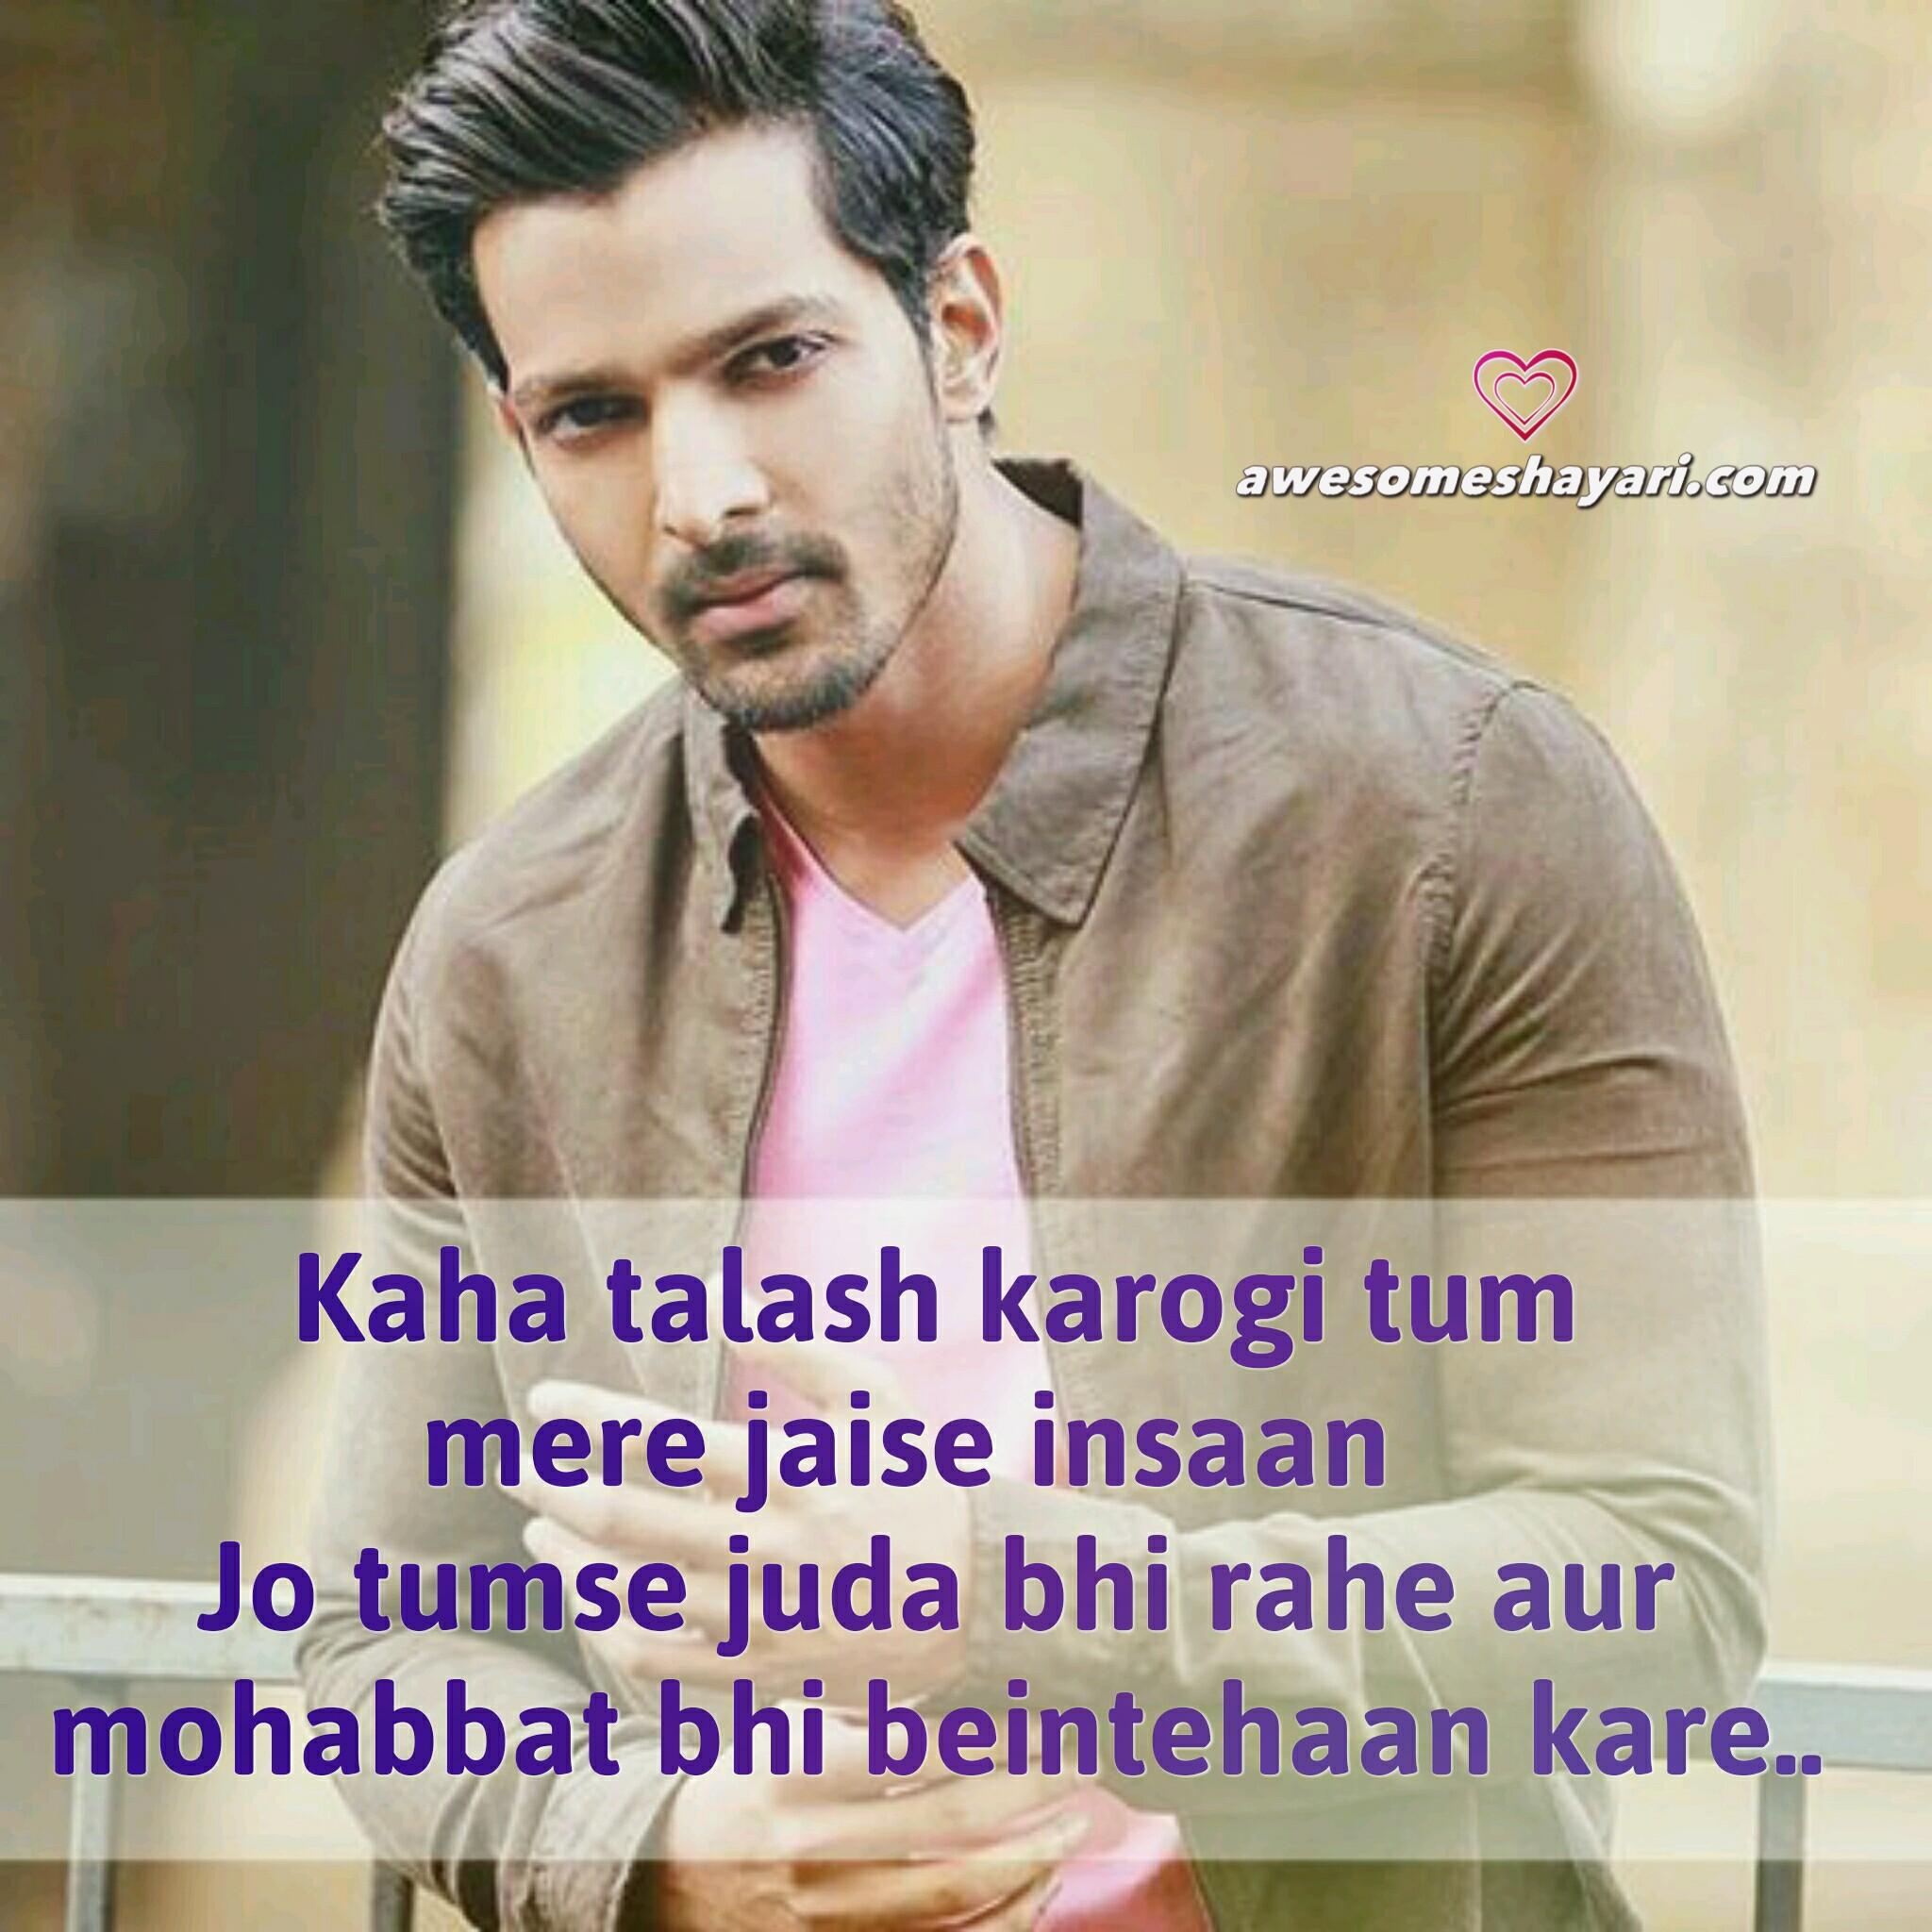 Best Hindi Sad Shayari about Painful Moments of Love